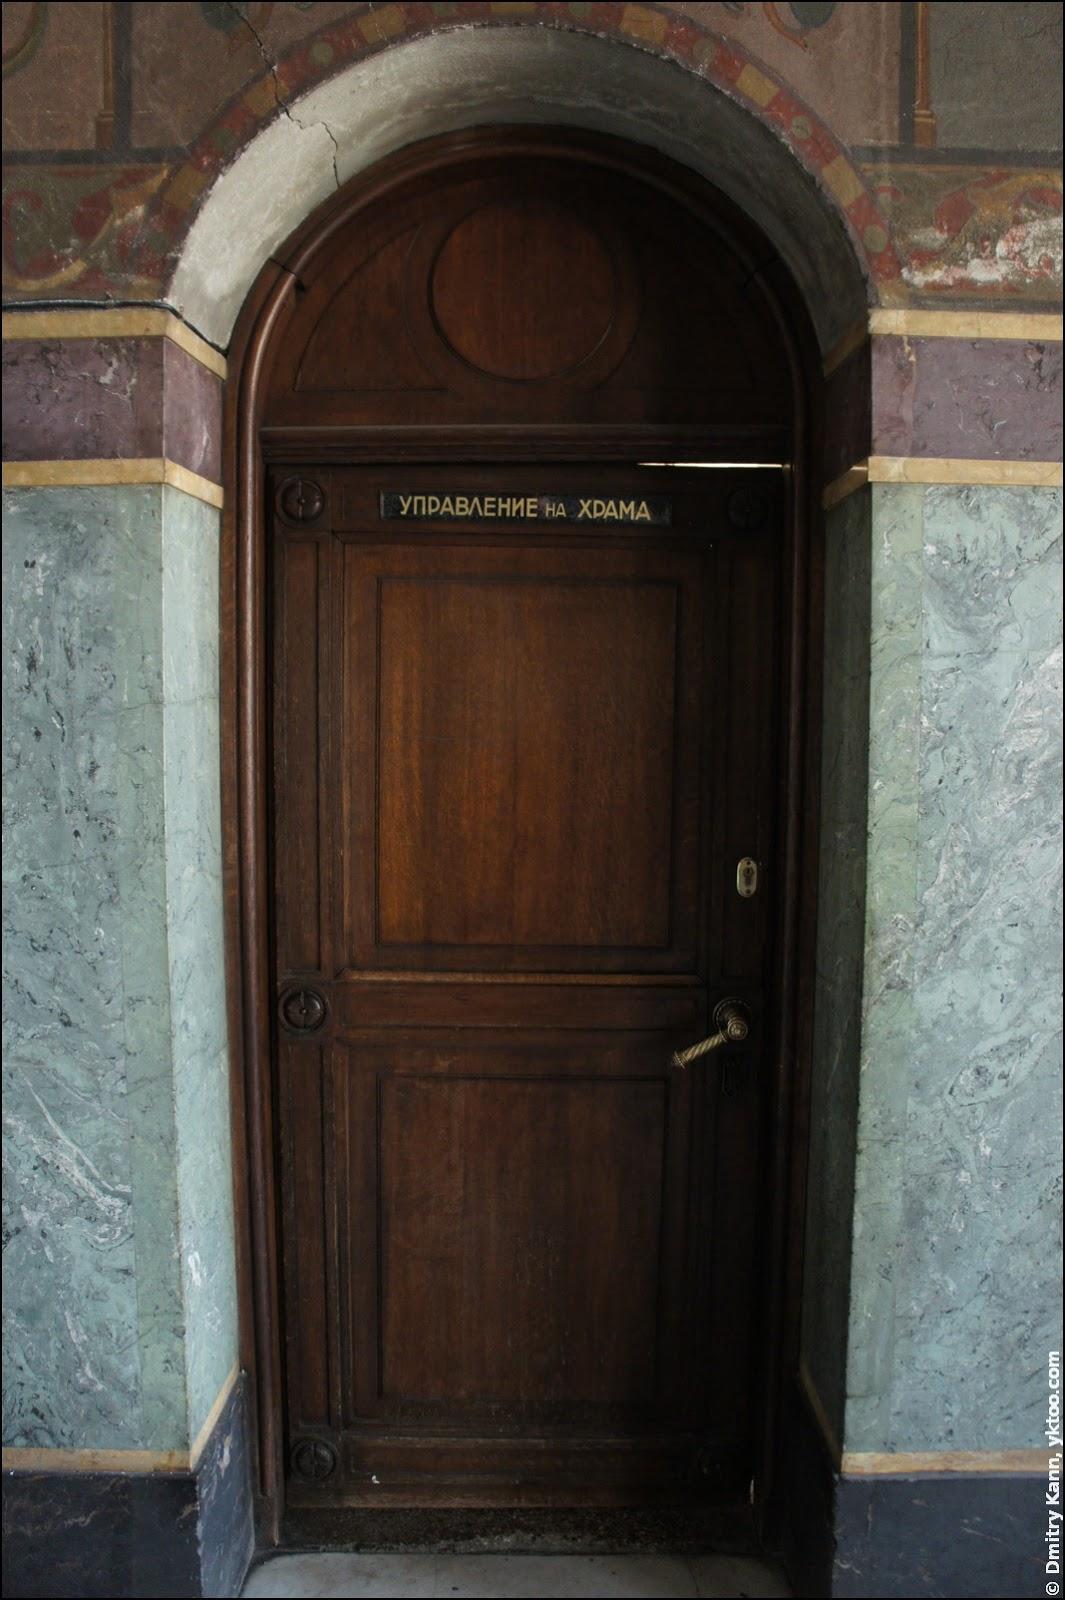 Alexander Nevsky Cathedral: 'Управление на храма.'